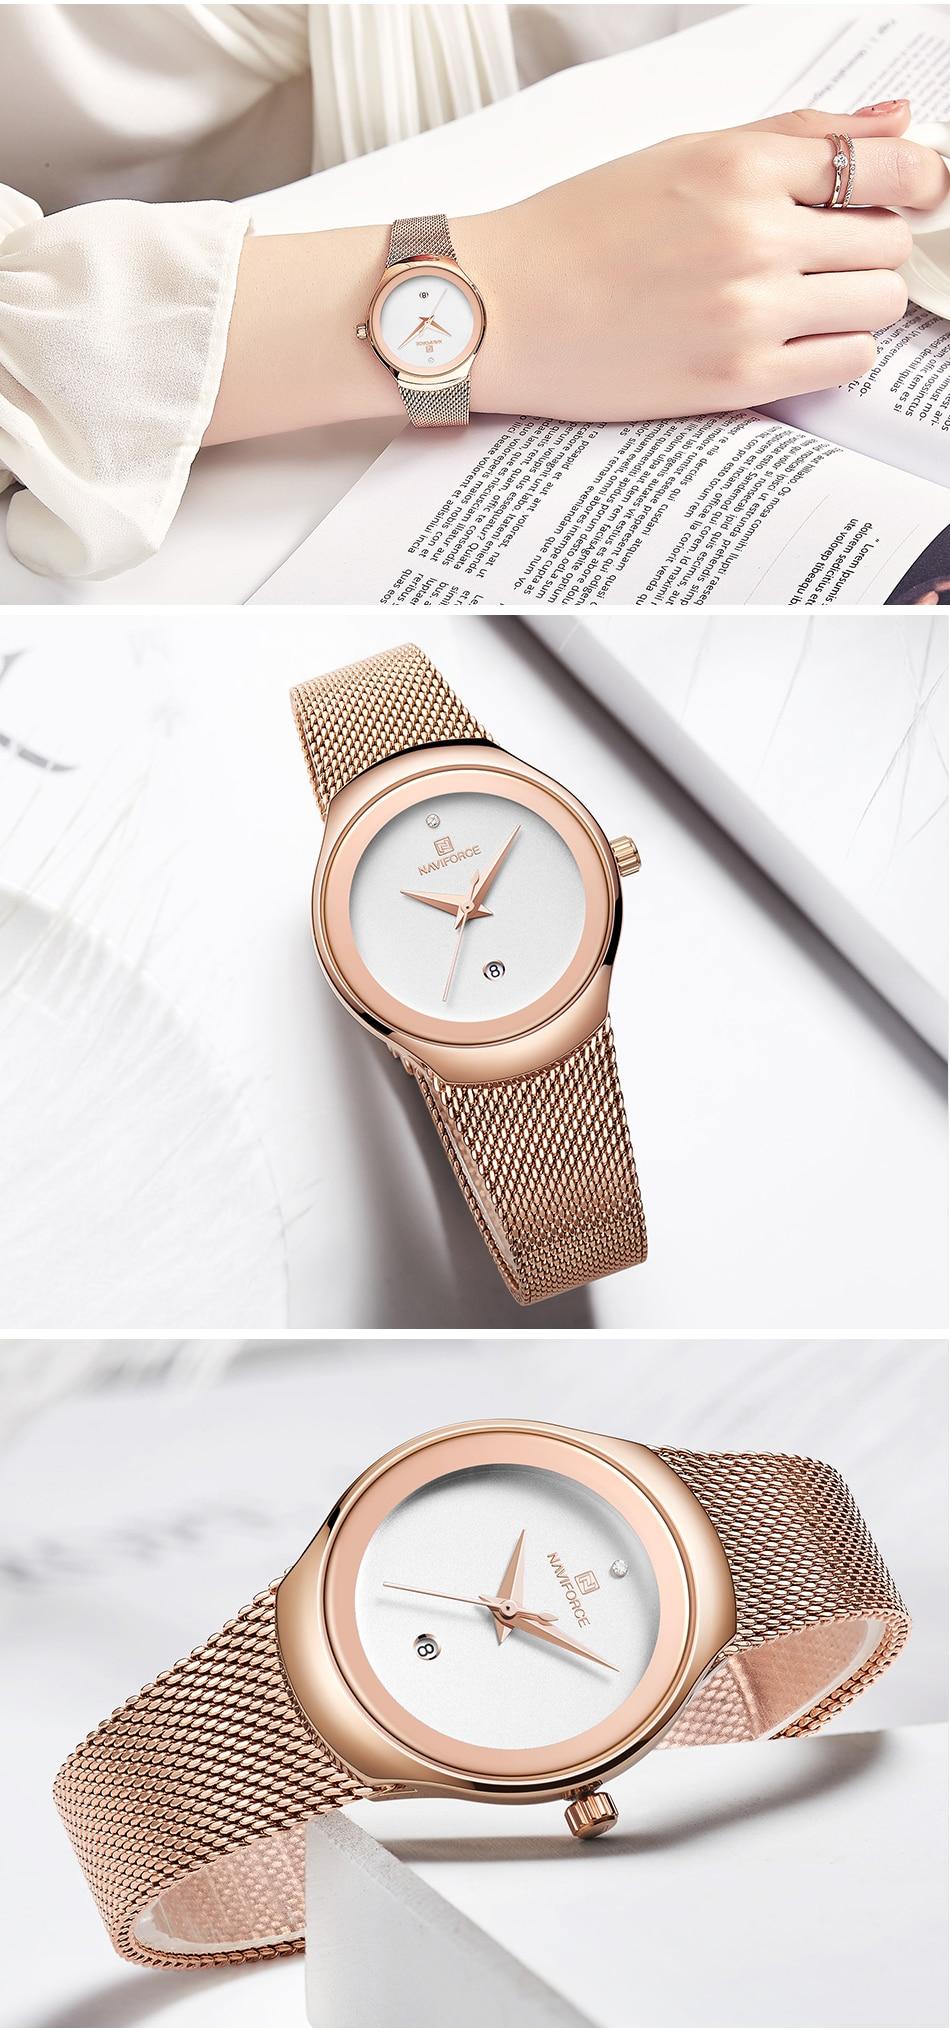 NAVIFORCE Top Luxury Brand Women Watches Female Fashion Simple Quartz Watch Ladies Classic Stainless Steel Mesh Belt Wrist Watch 10